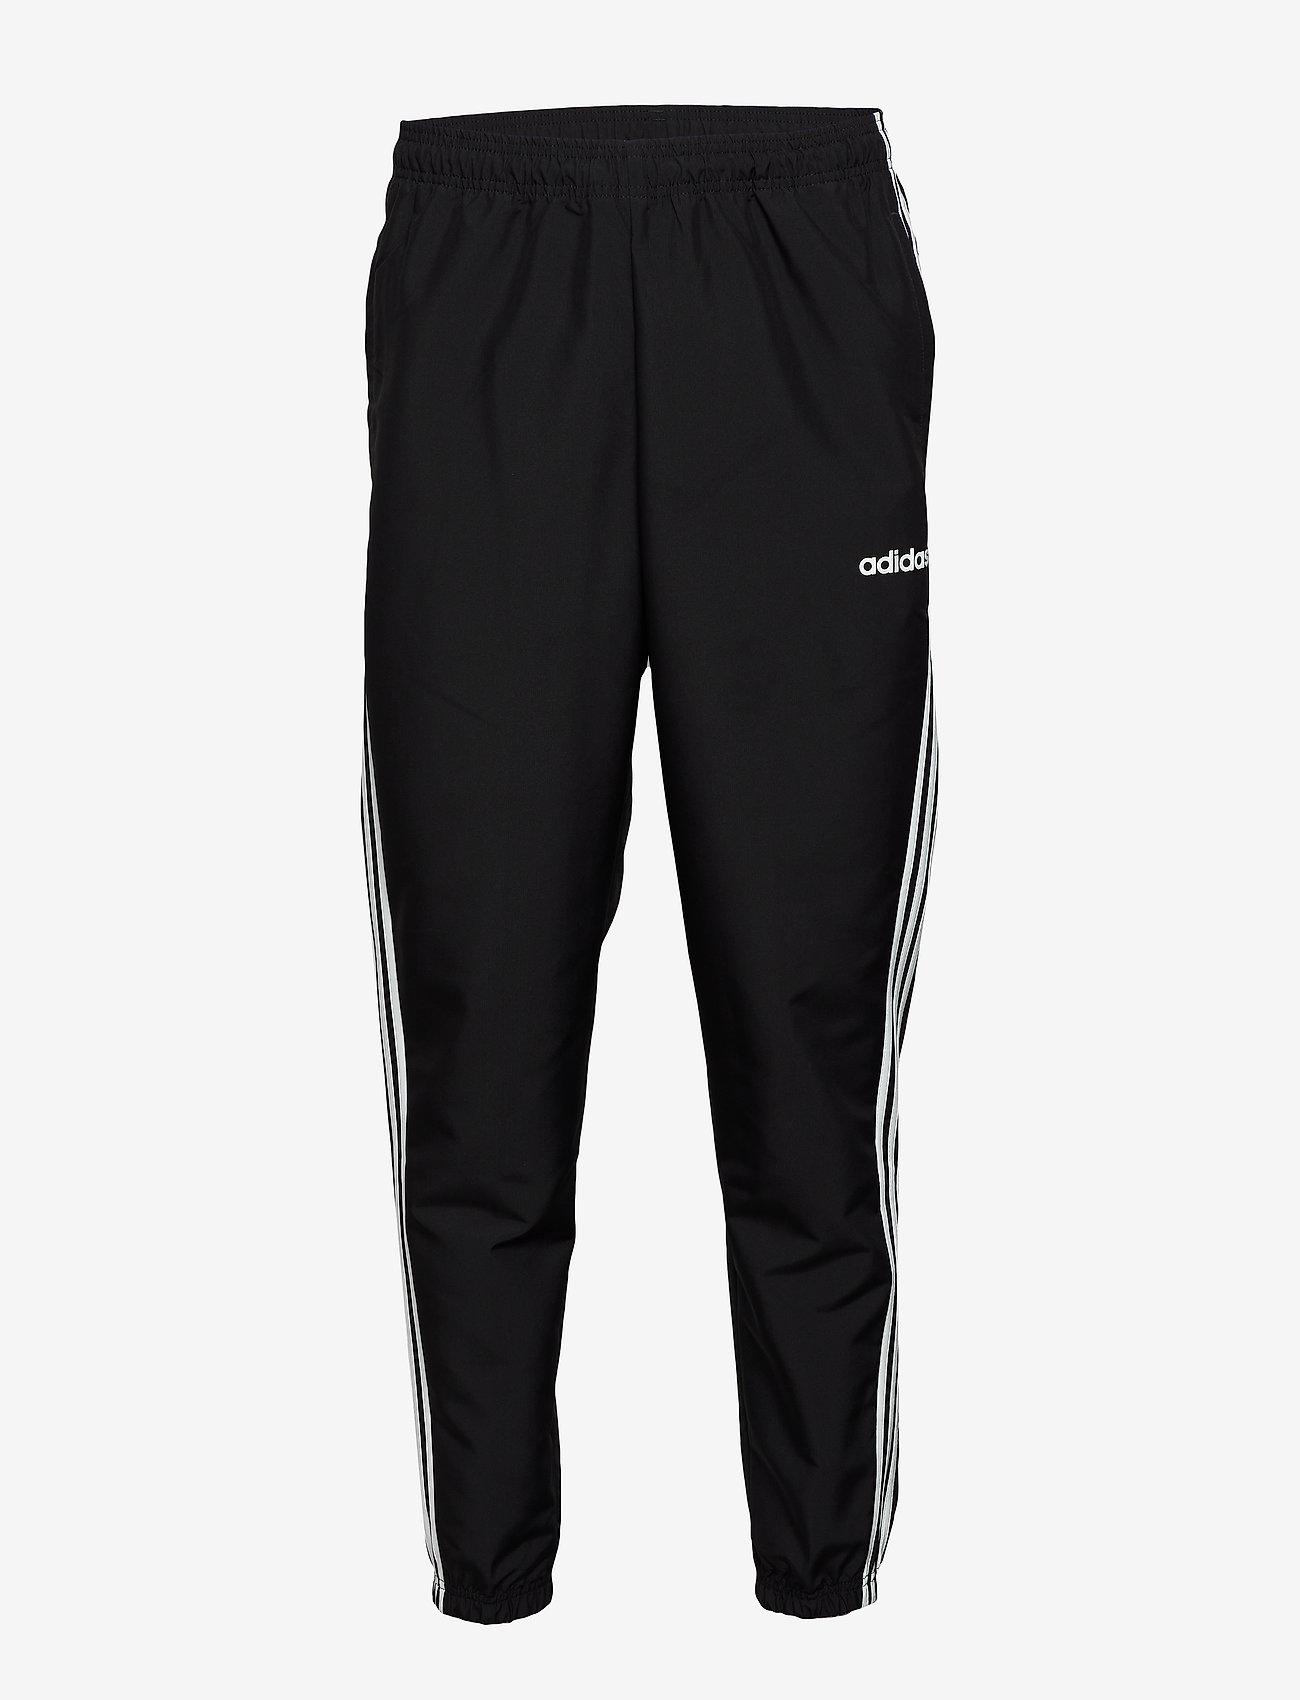 adidas Performance - E 3S WIND PNT - pants - black/white - 1